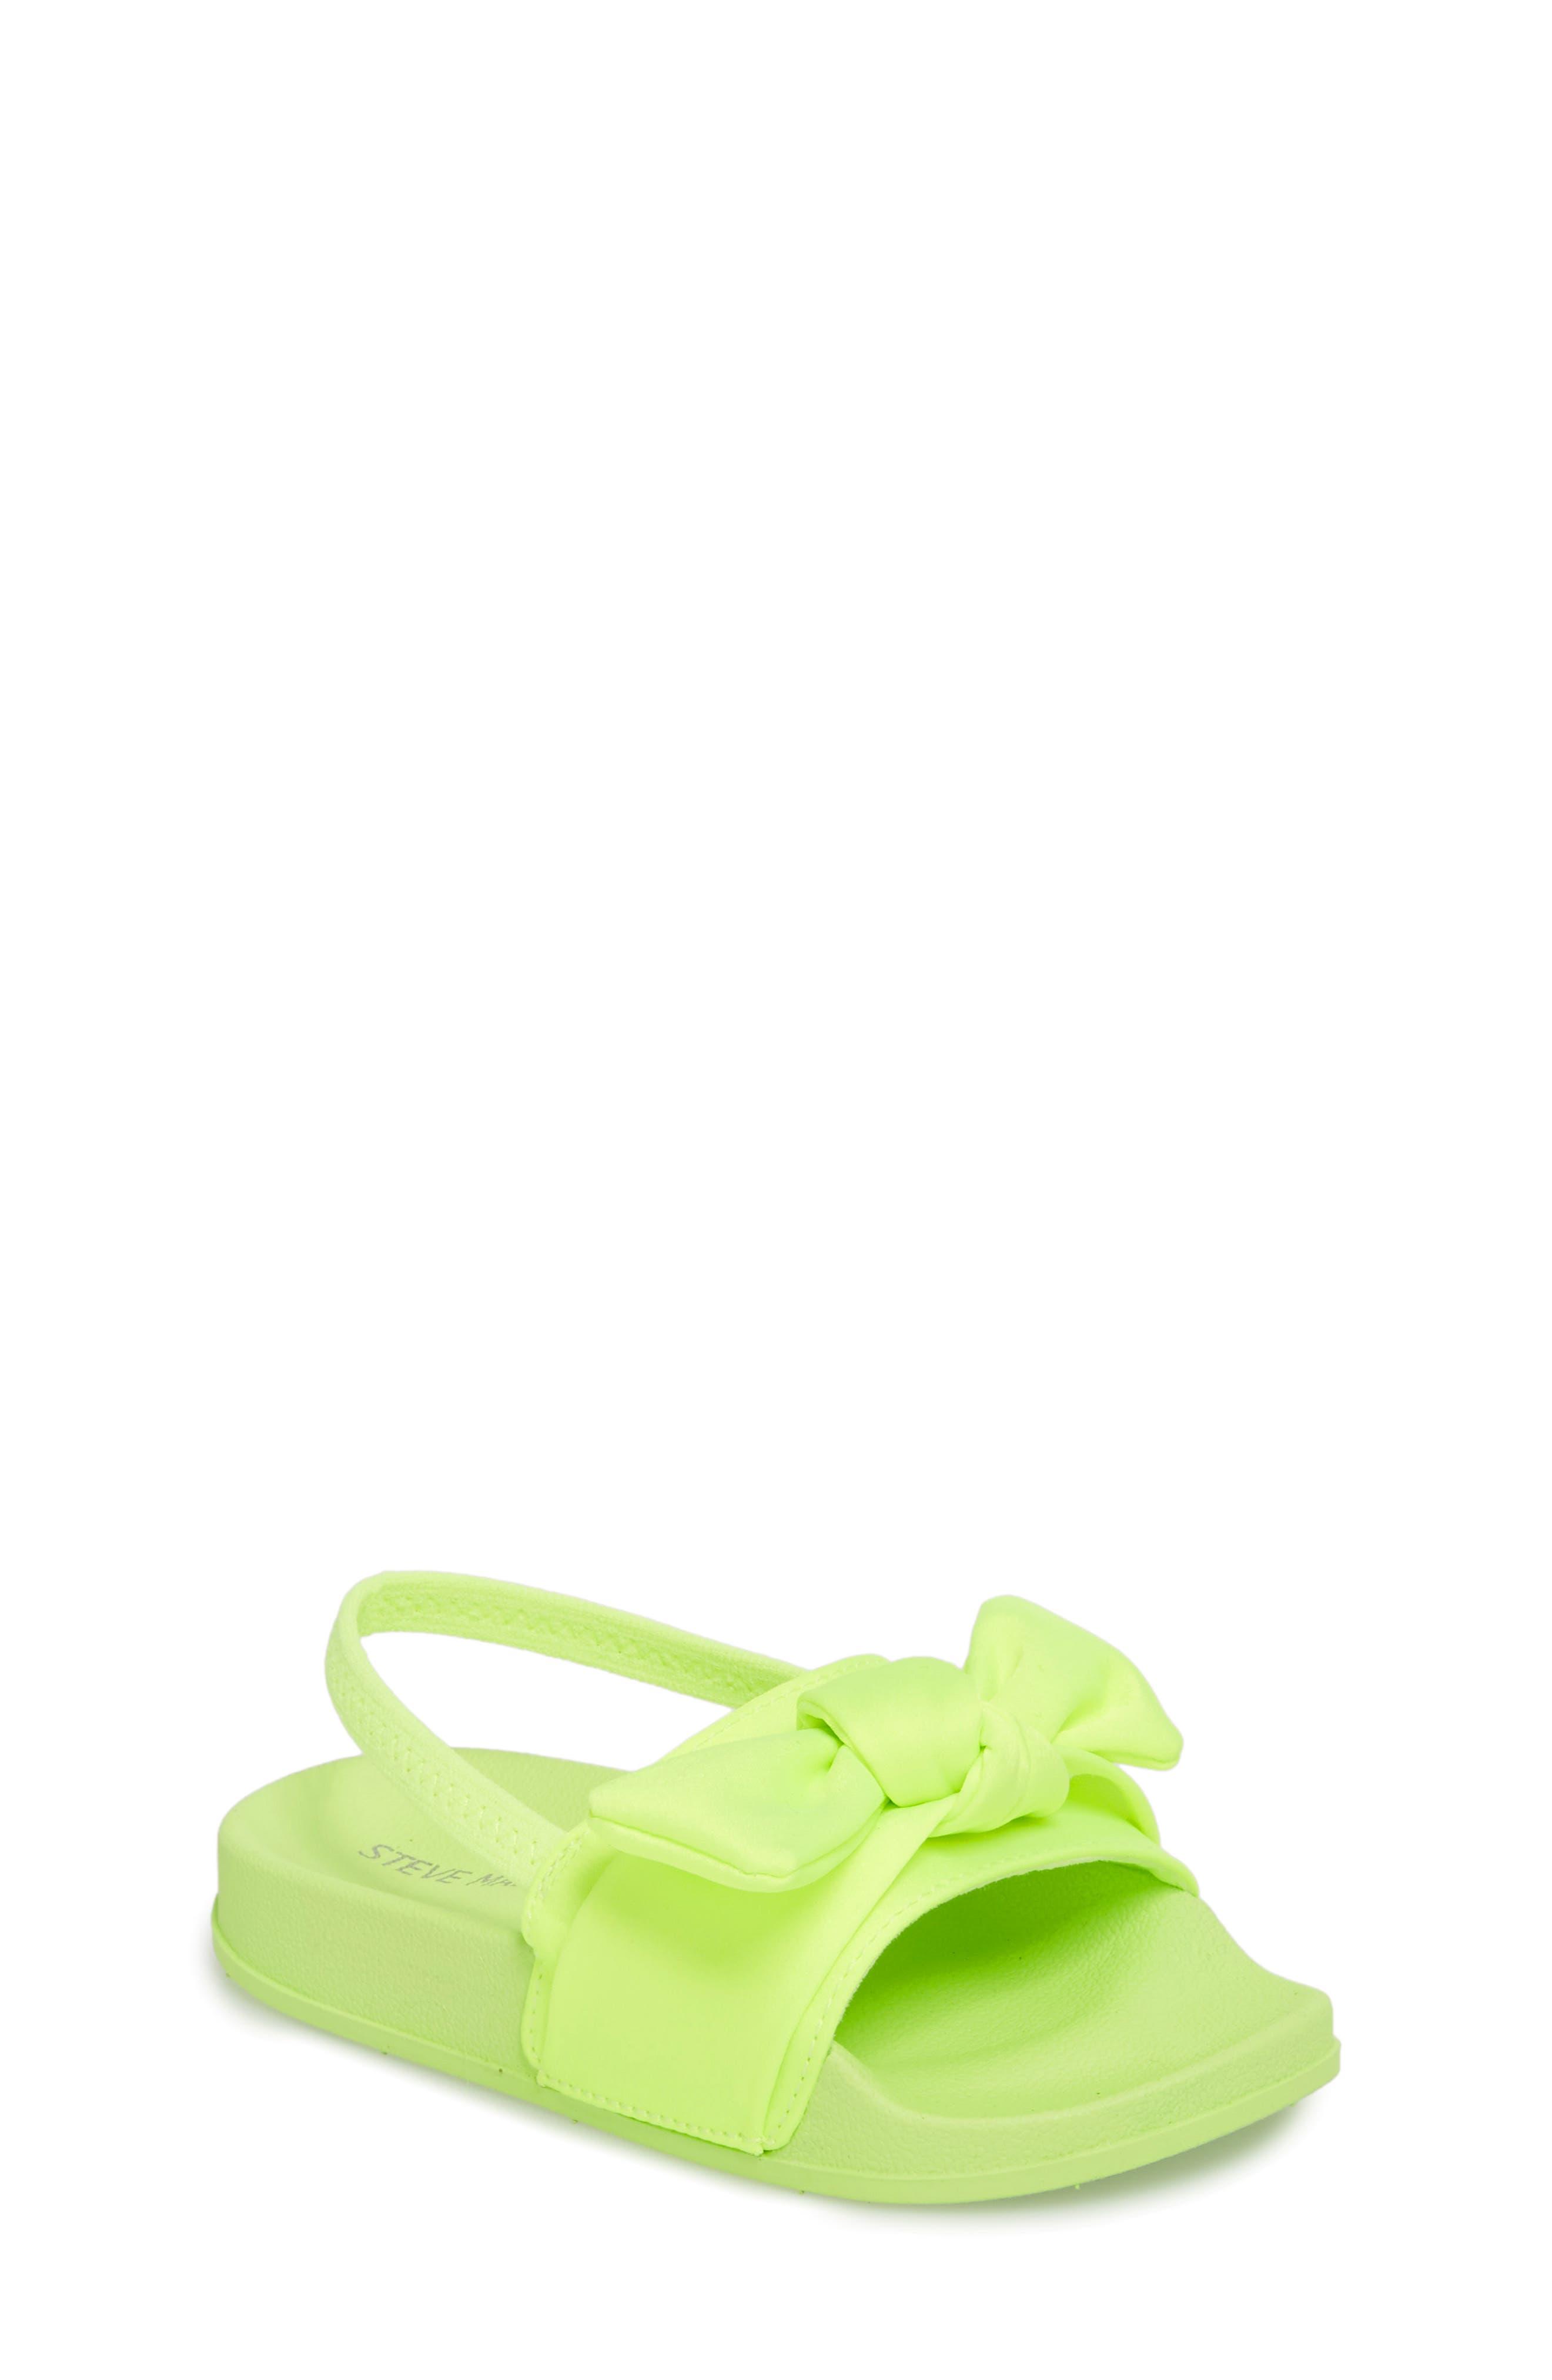 Tsilky Knotted Slide Sandal,                             Main thumbnail 5, color,